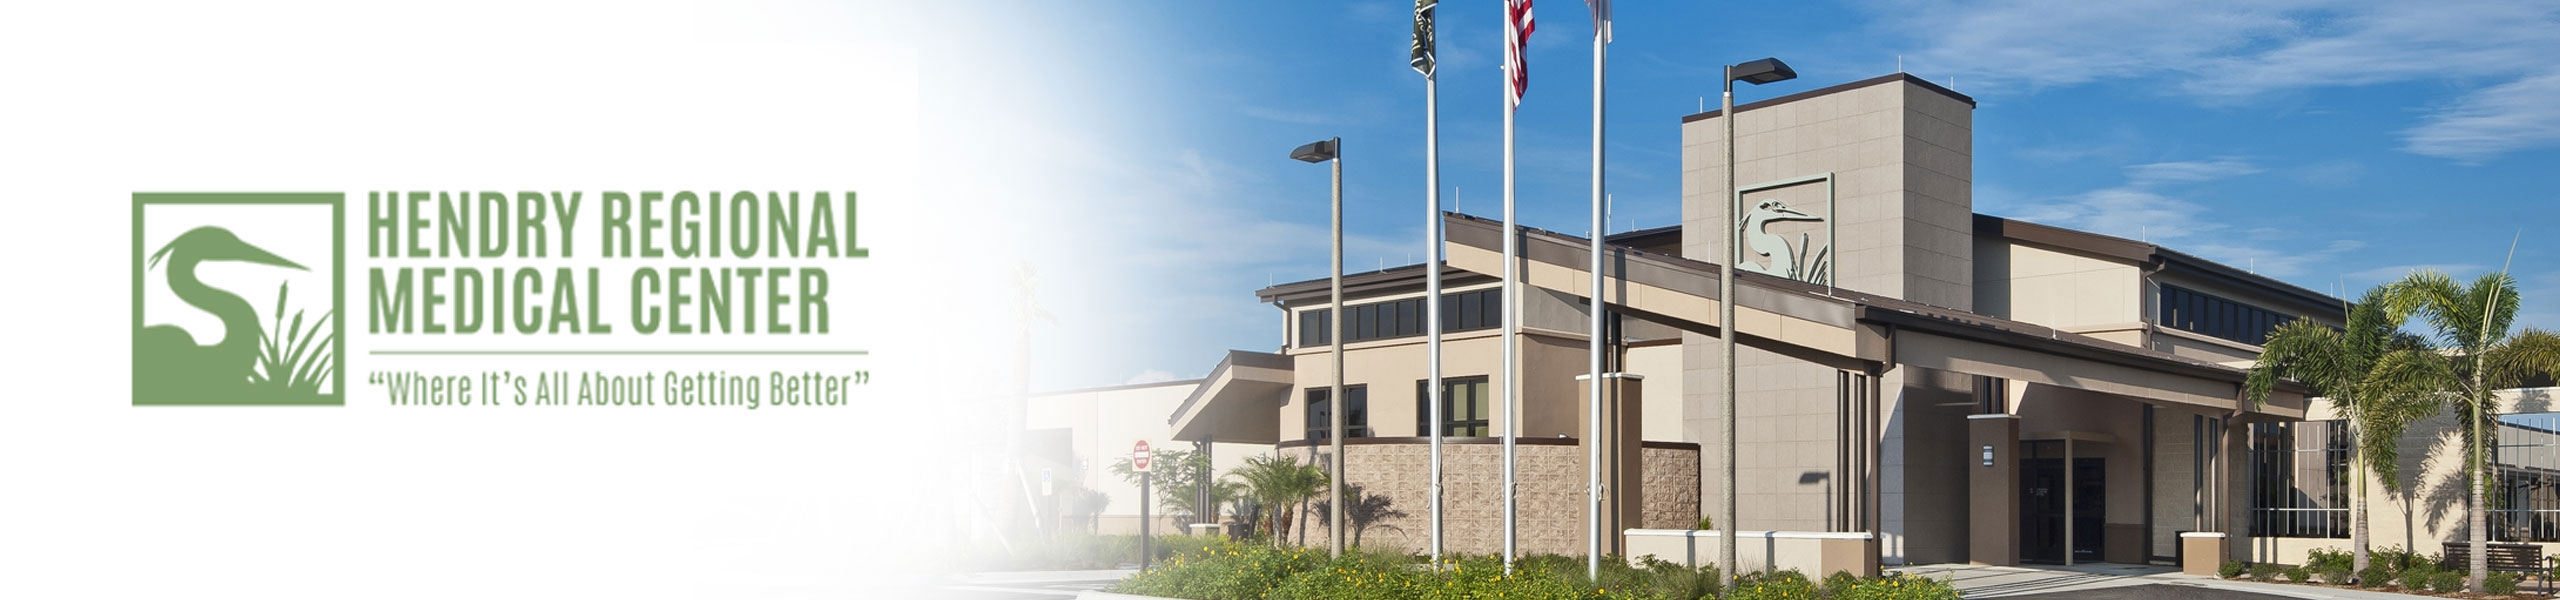 Hendry Regional Medical Center